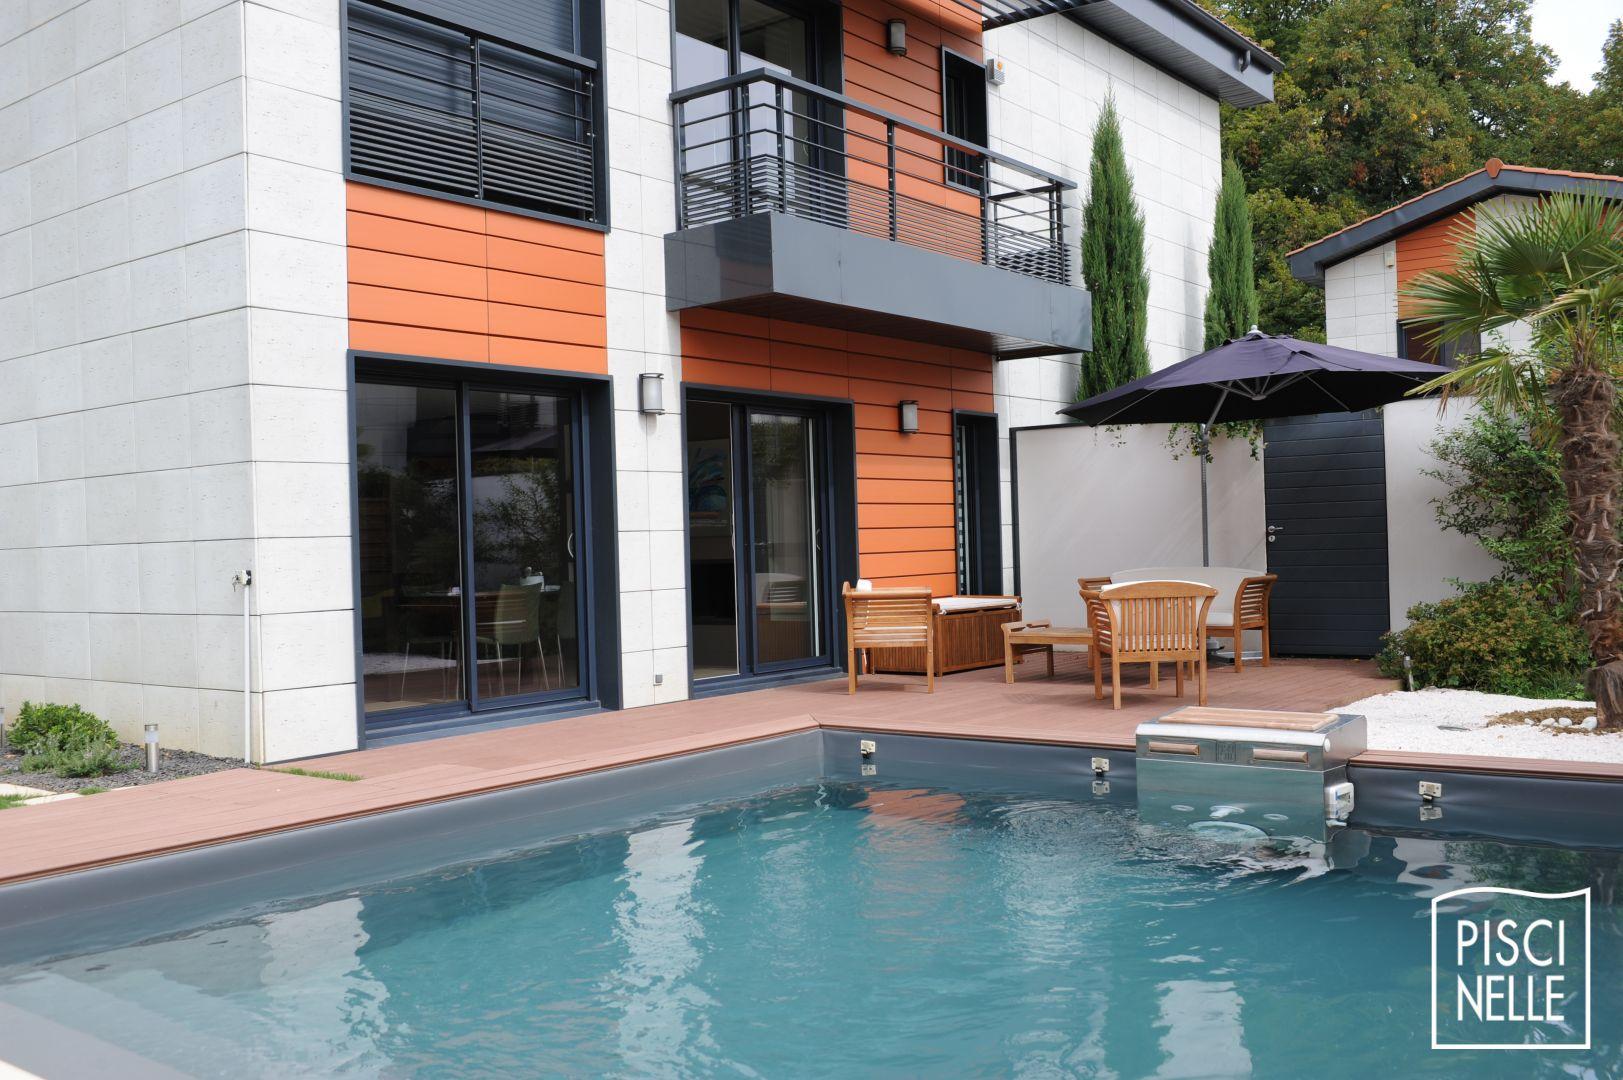 Piscine carre bleu tarif piscine bermudes blanc gris for Carre bleu piscine prix